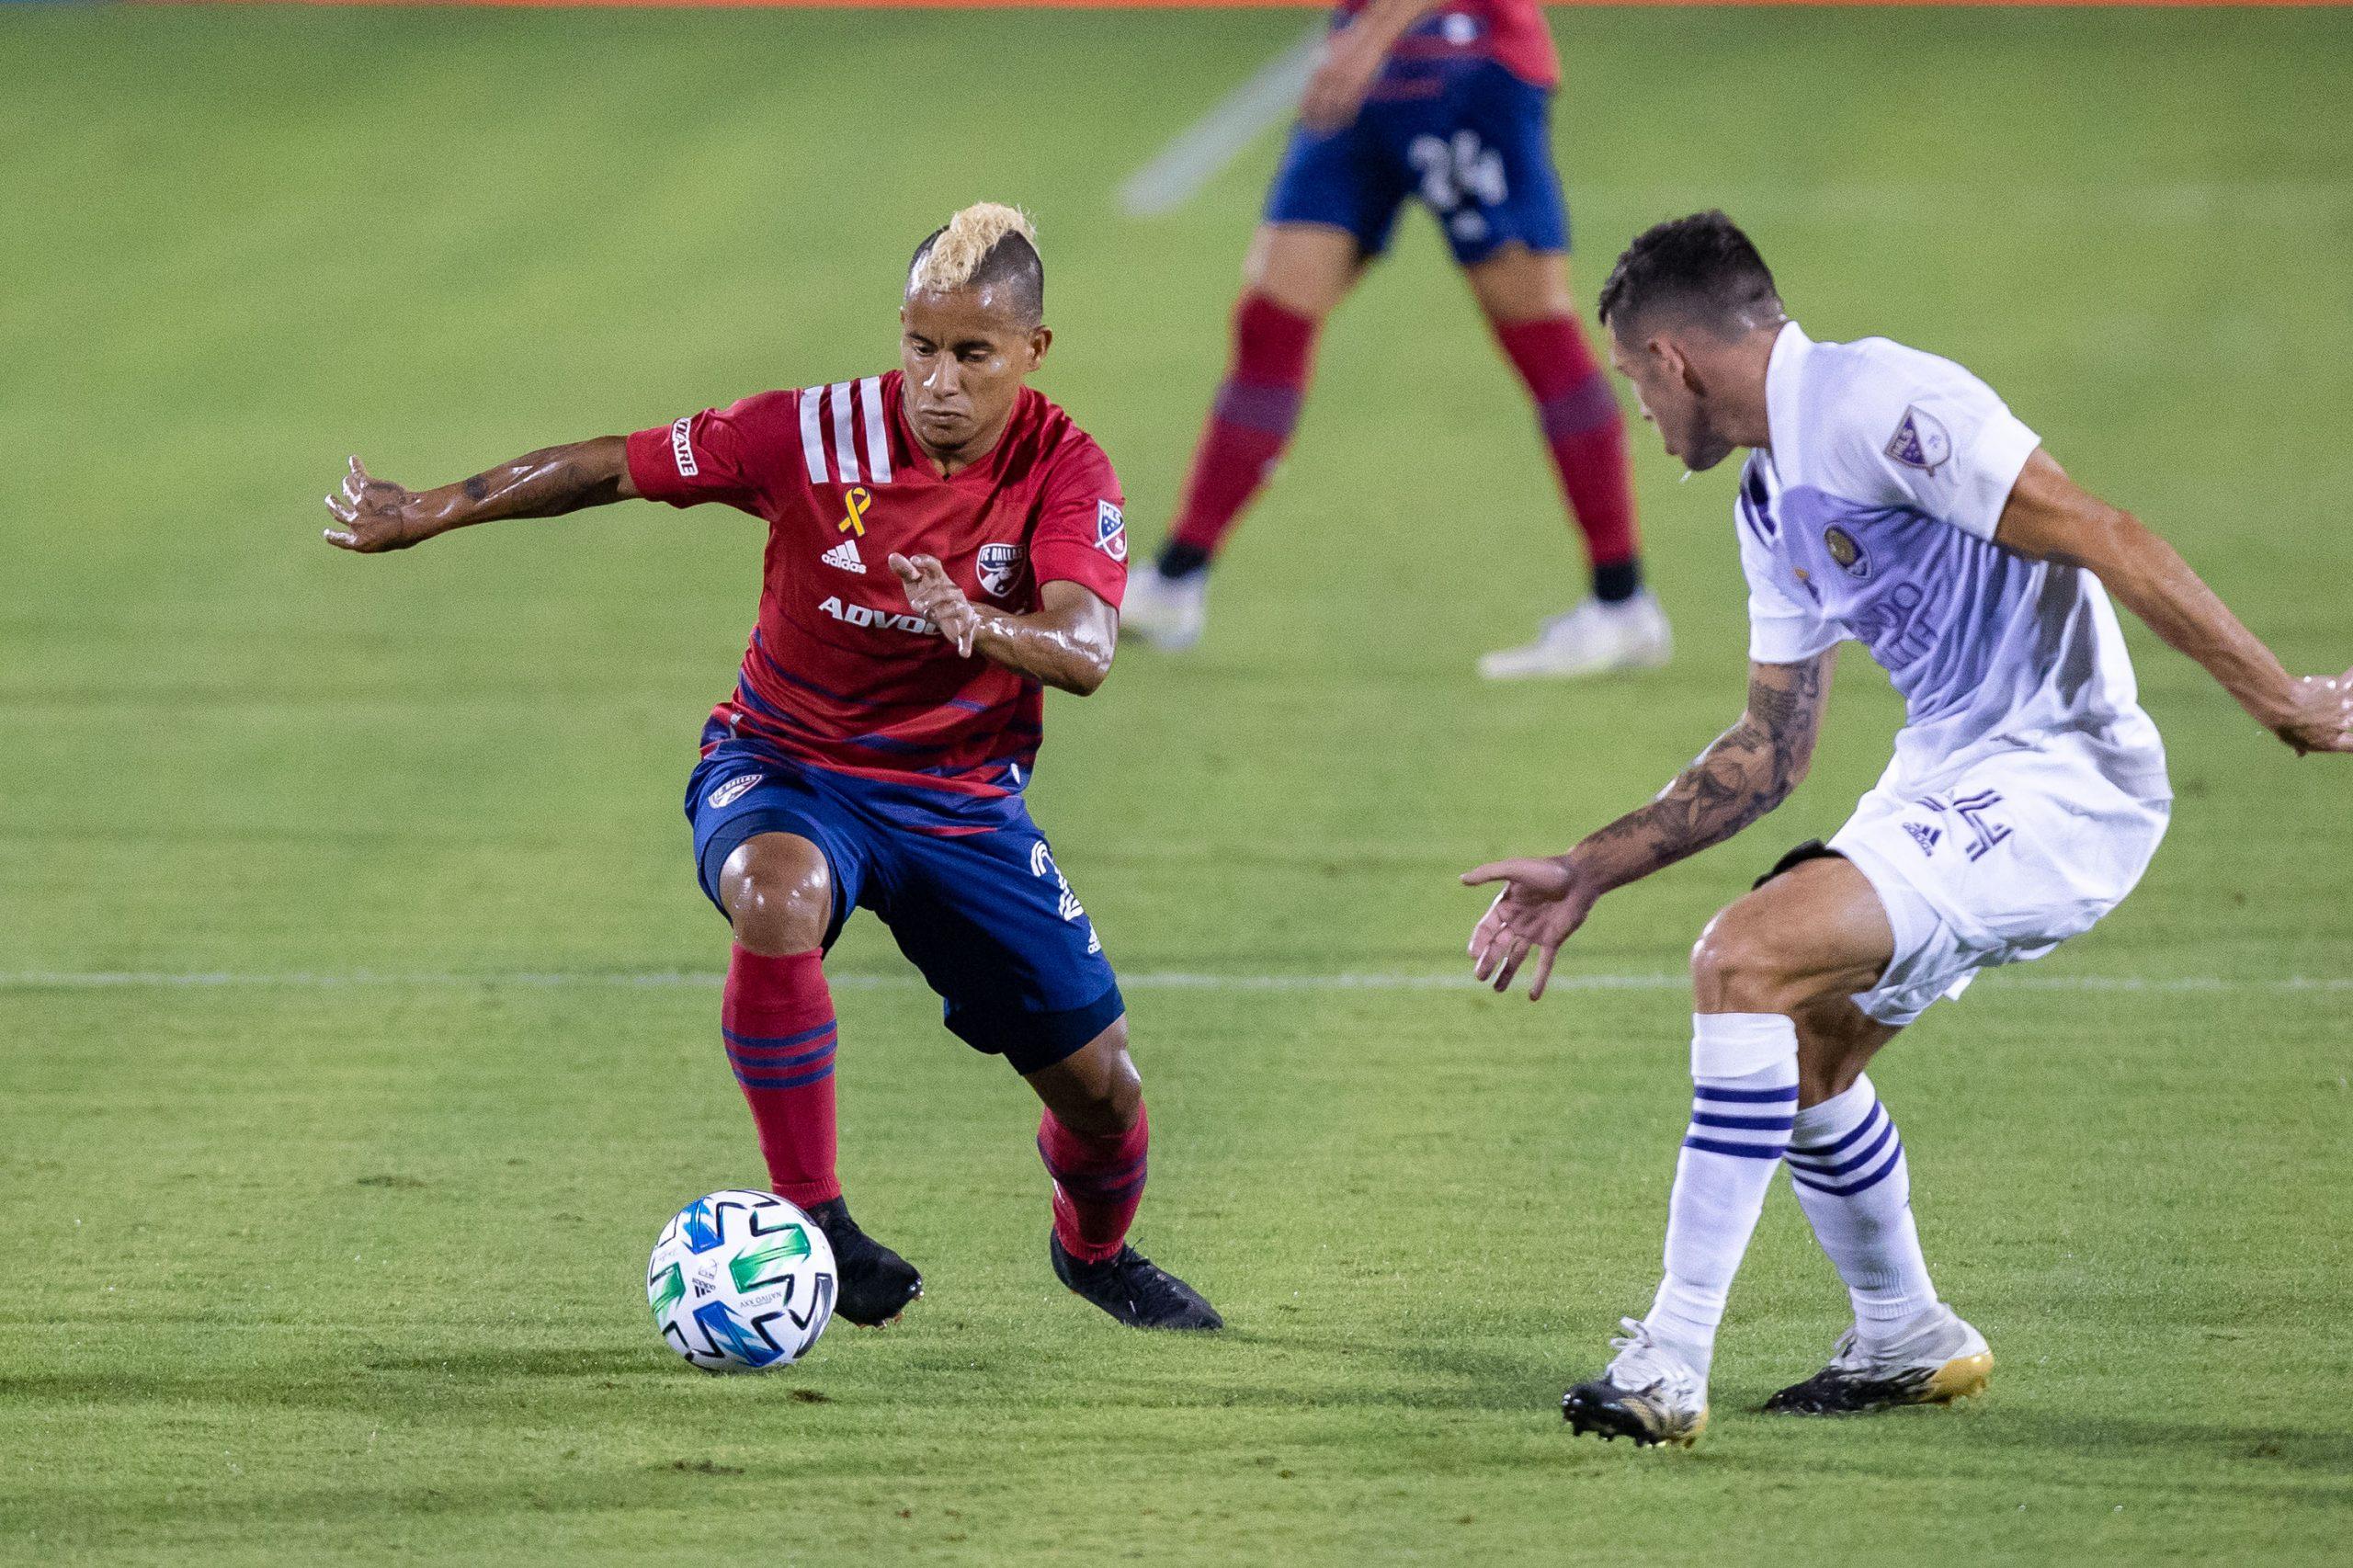 Barrios FCD v Orlando 9-27-20 070